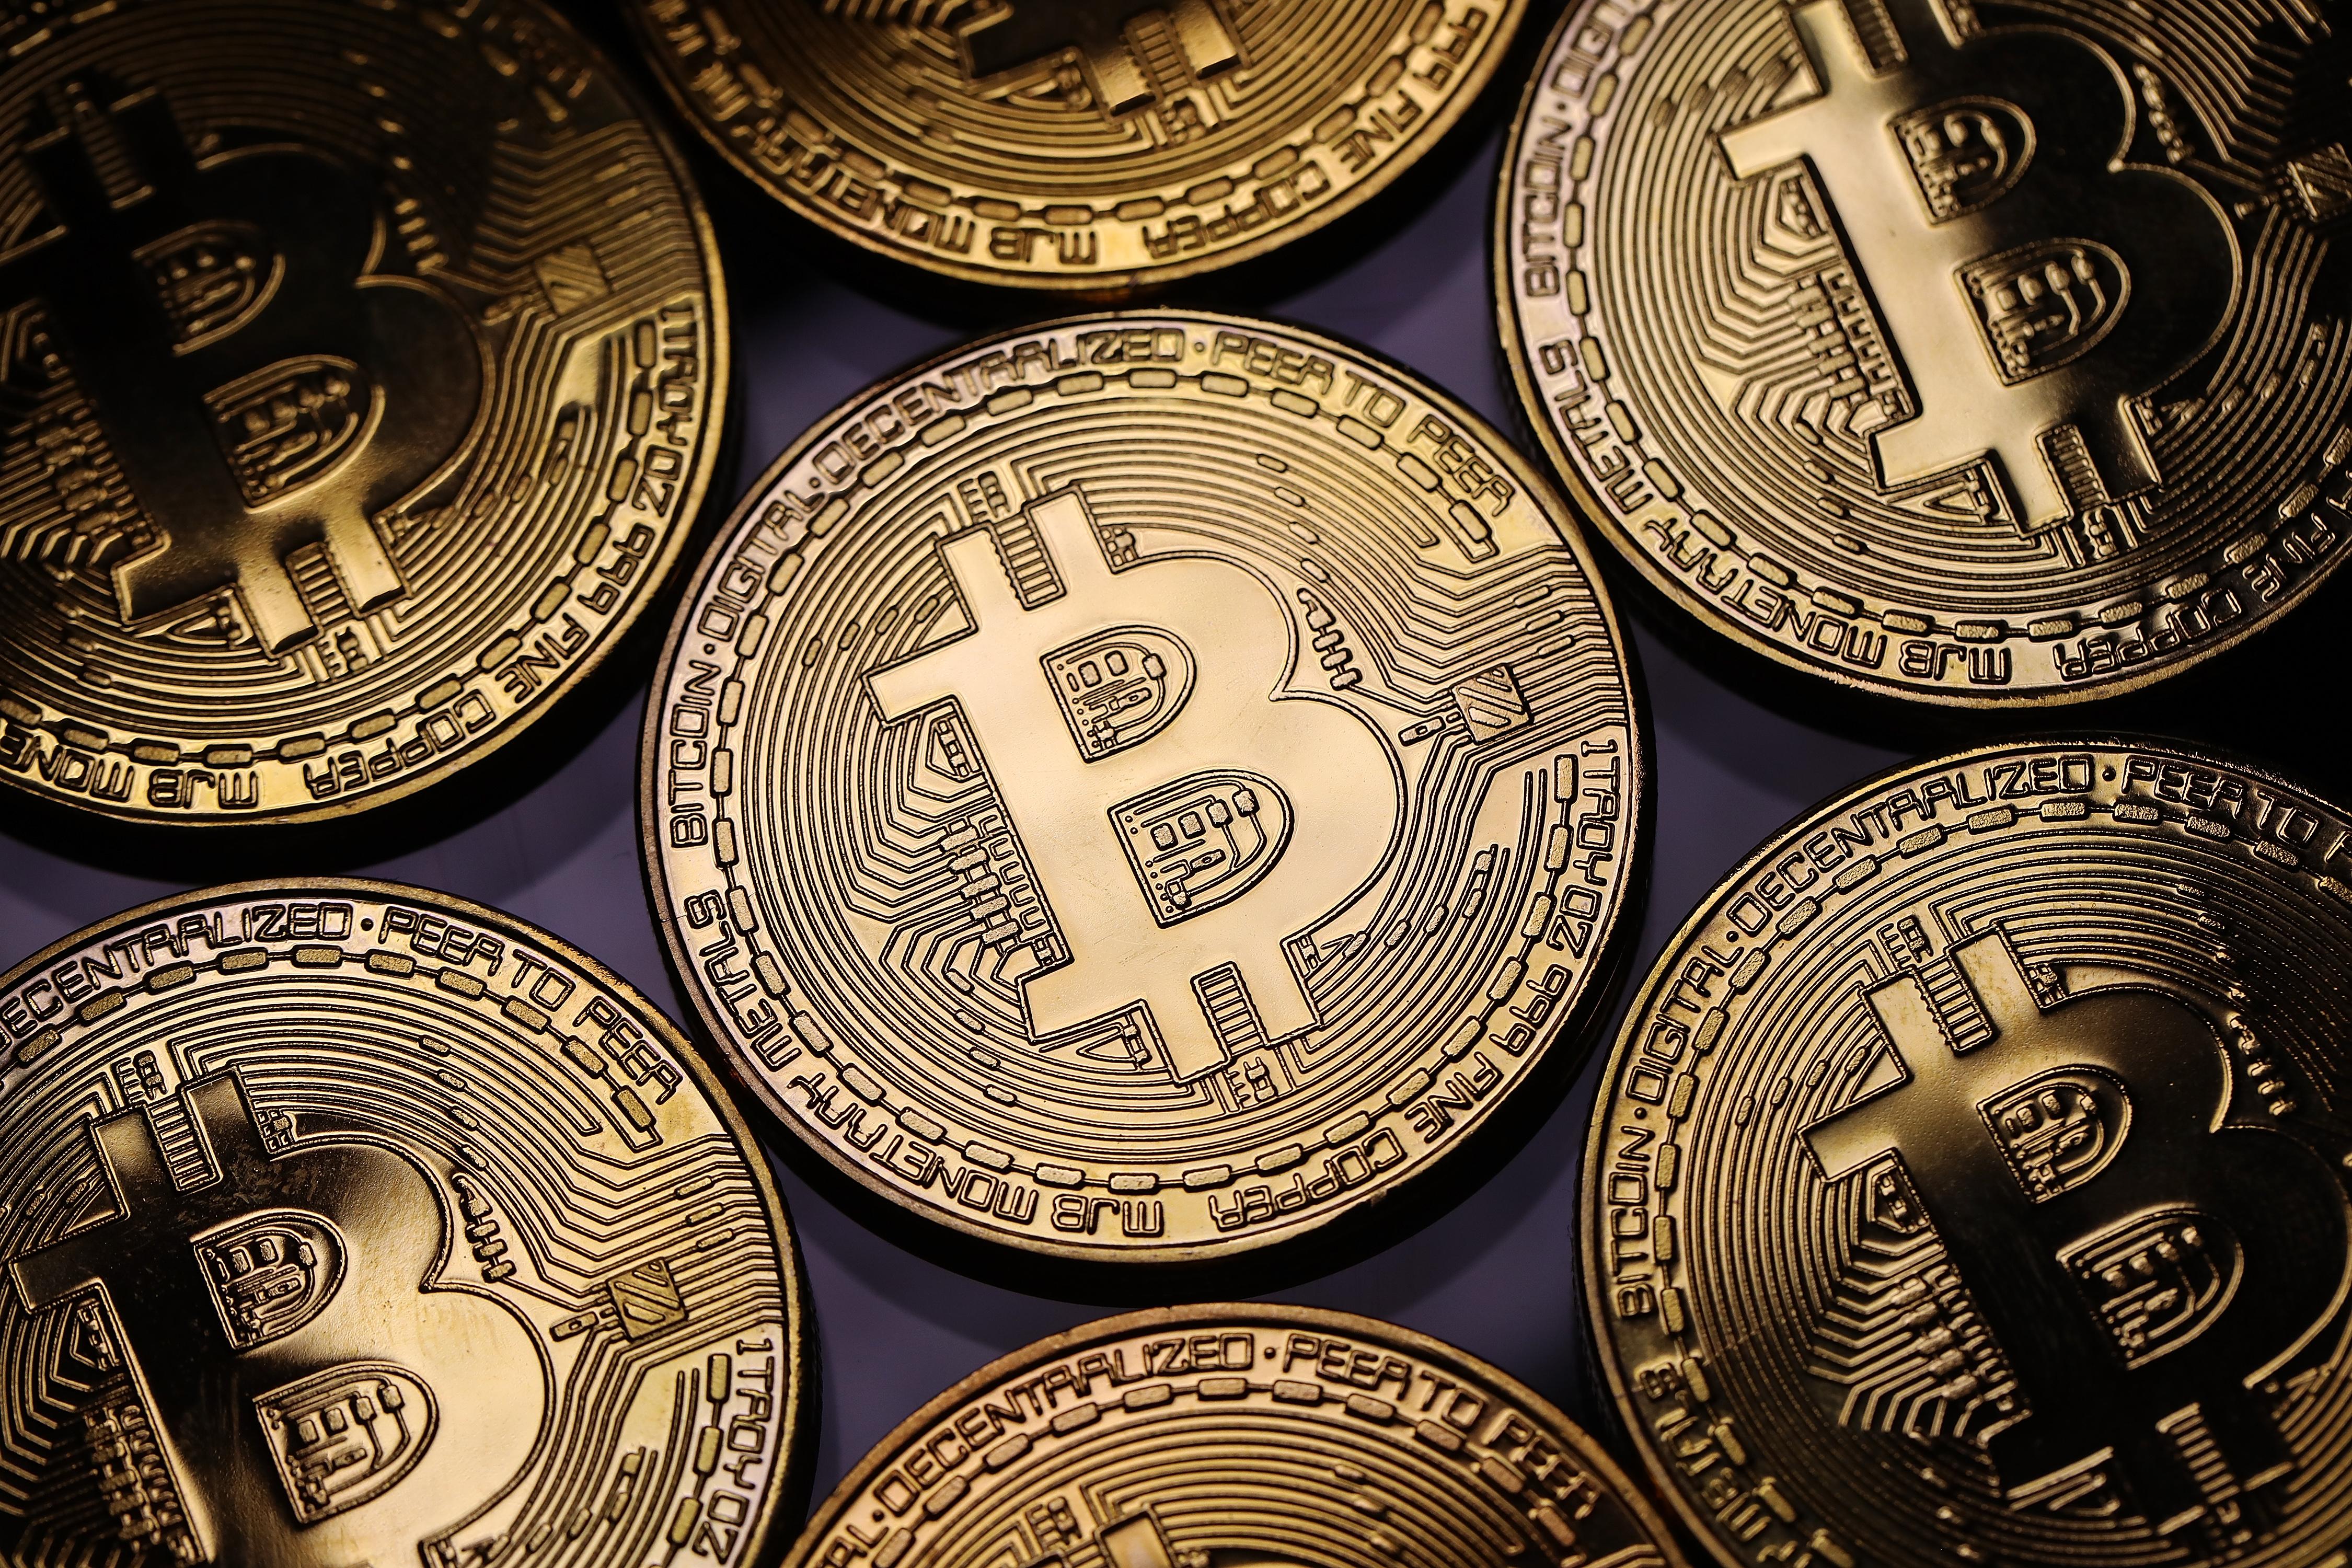 Babysit your bitcoins worth world sports betting vouchers